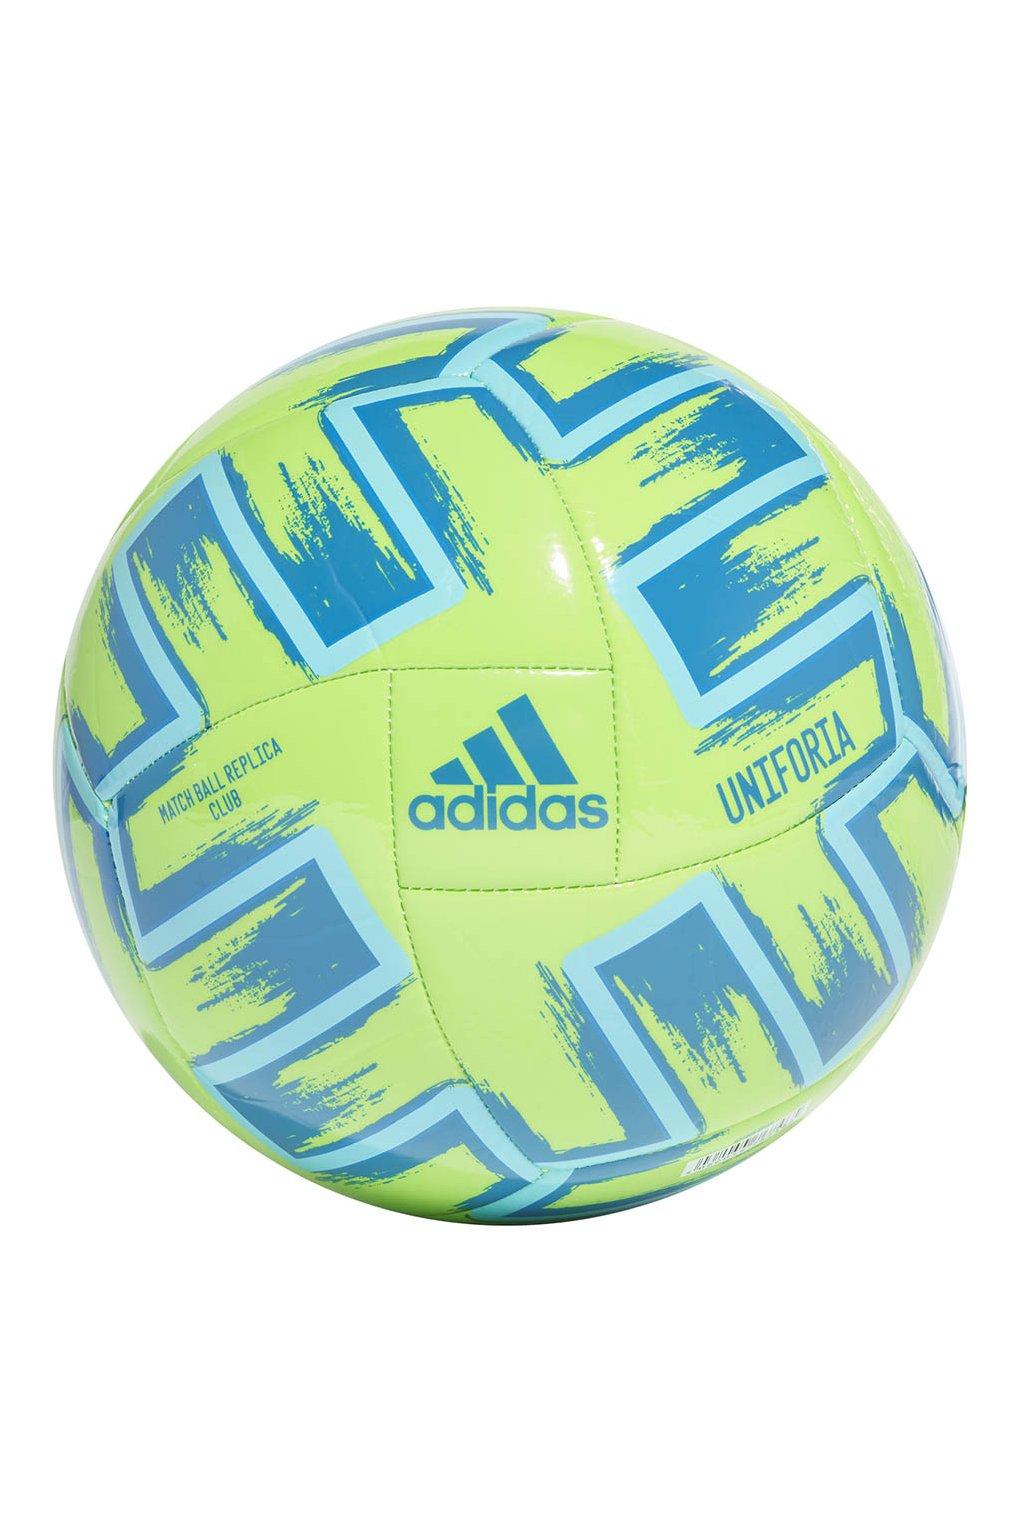 Futbalová lopta Adidas Uniforia FH7354 zelená